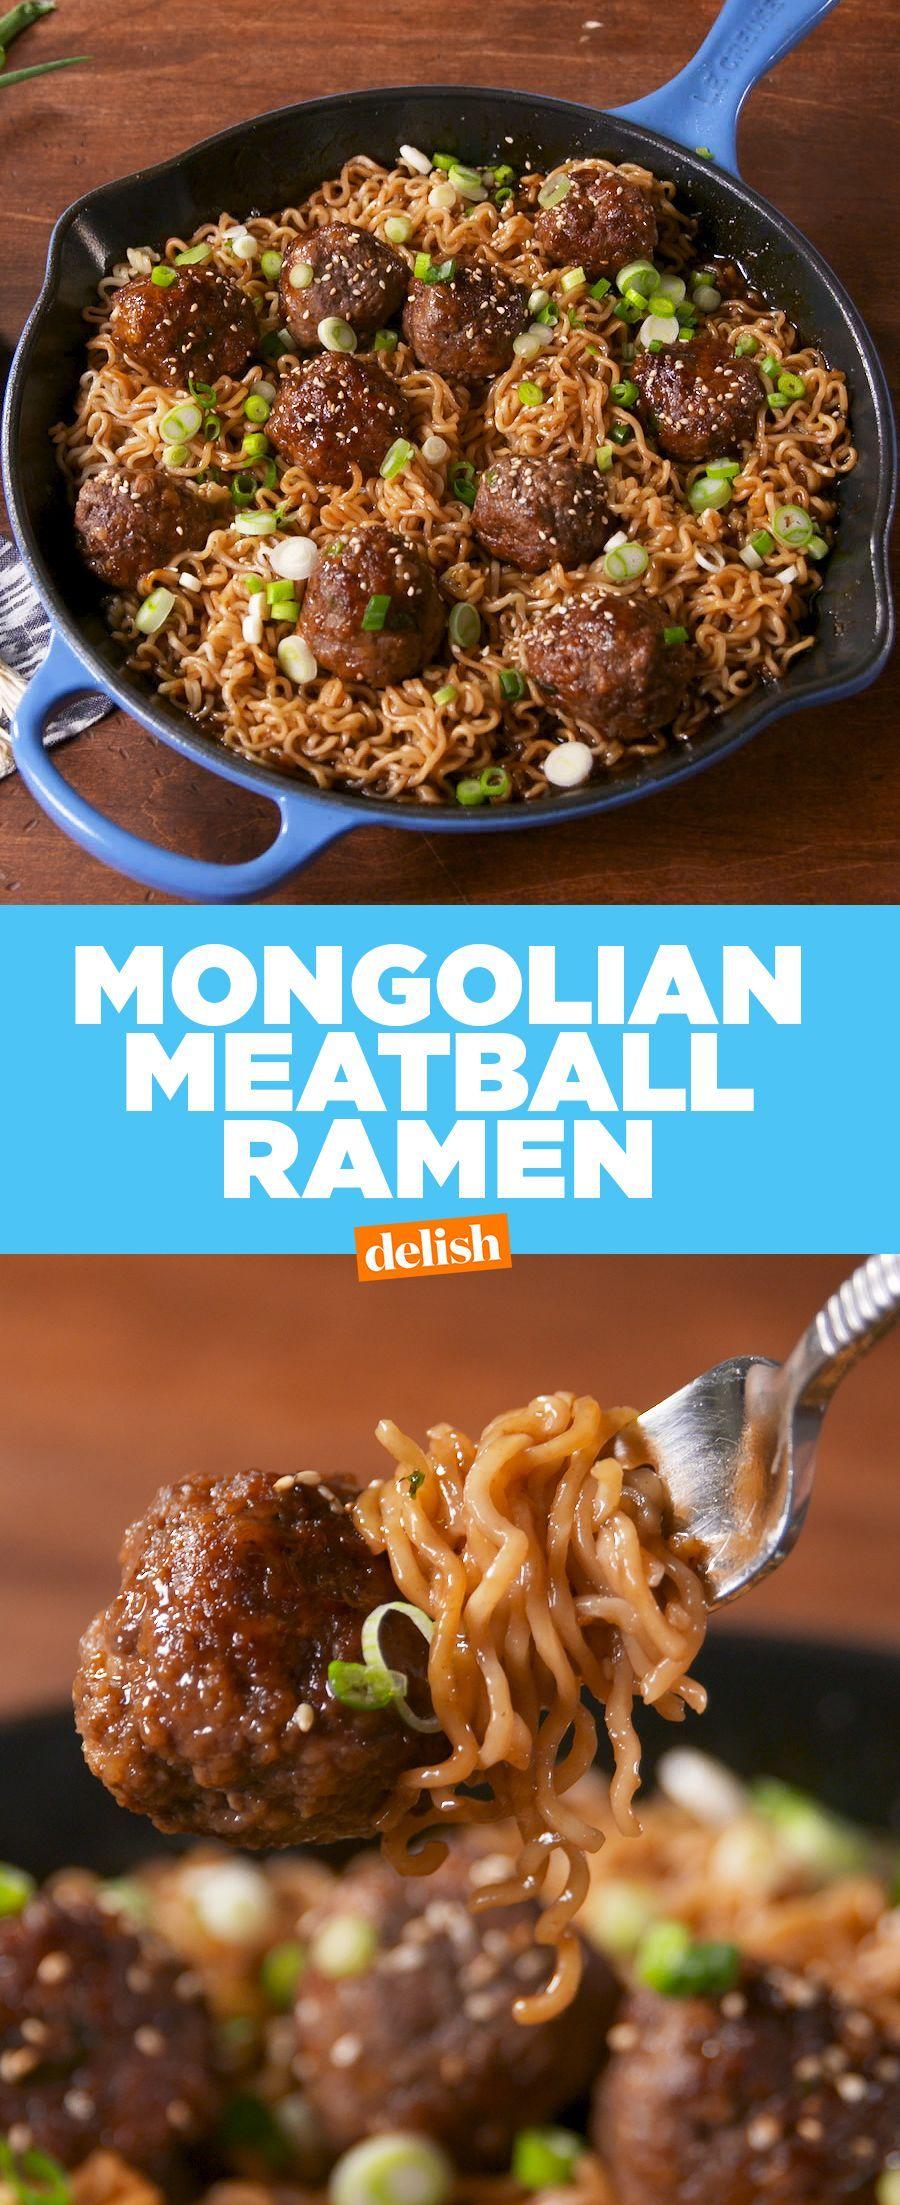 Meatball Ramen Mongolian Meatball Ramen is the sexier version of instant noodles. Get the recipe at .Mongolian Meatball Ramen is the sexier version of instant noodles. Get the recipe at .